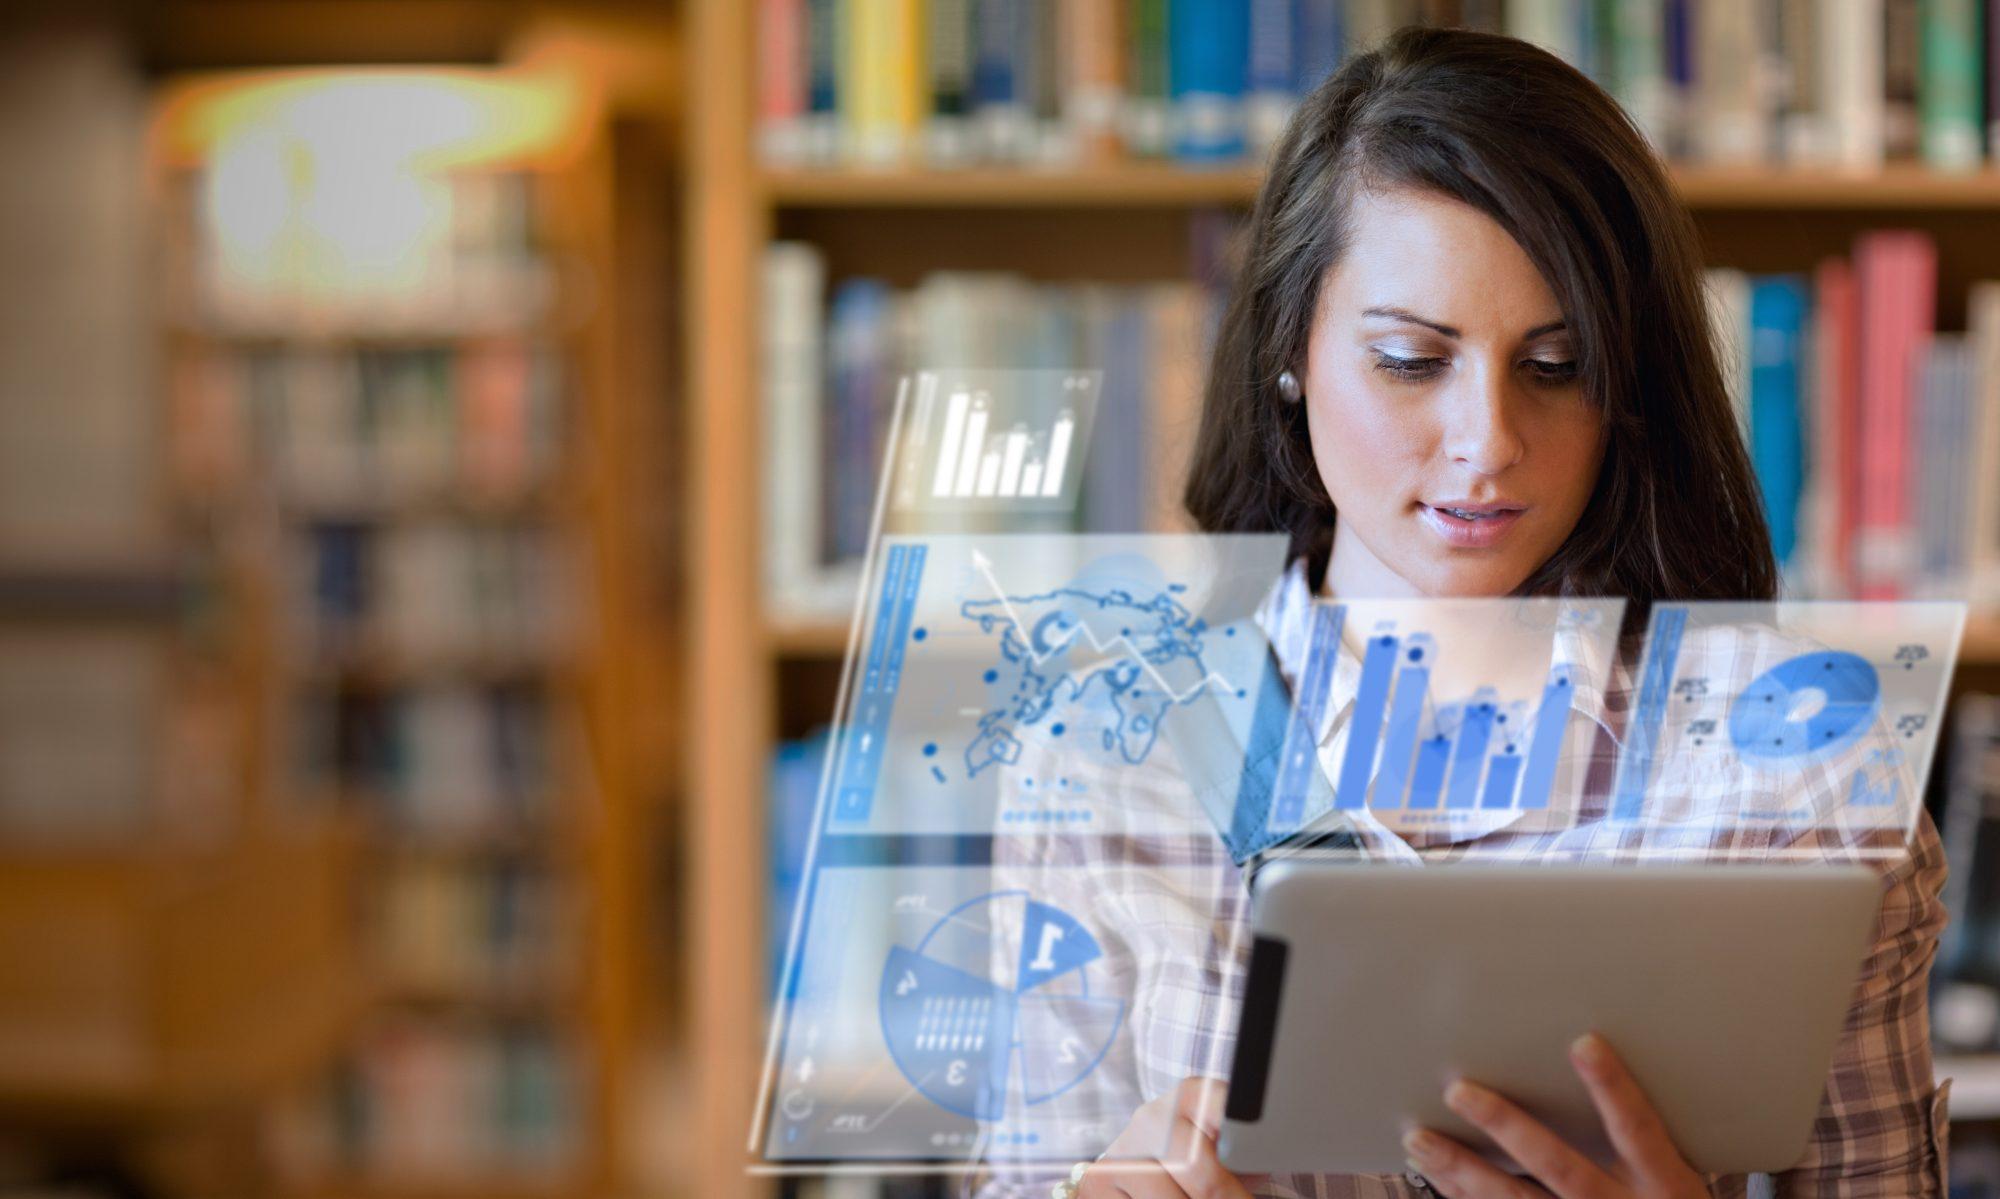 Онлайн-курсы для бизнес-аналитиков